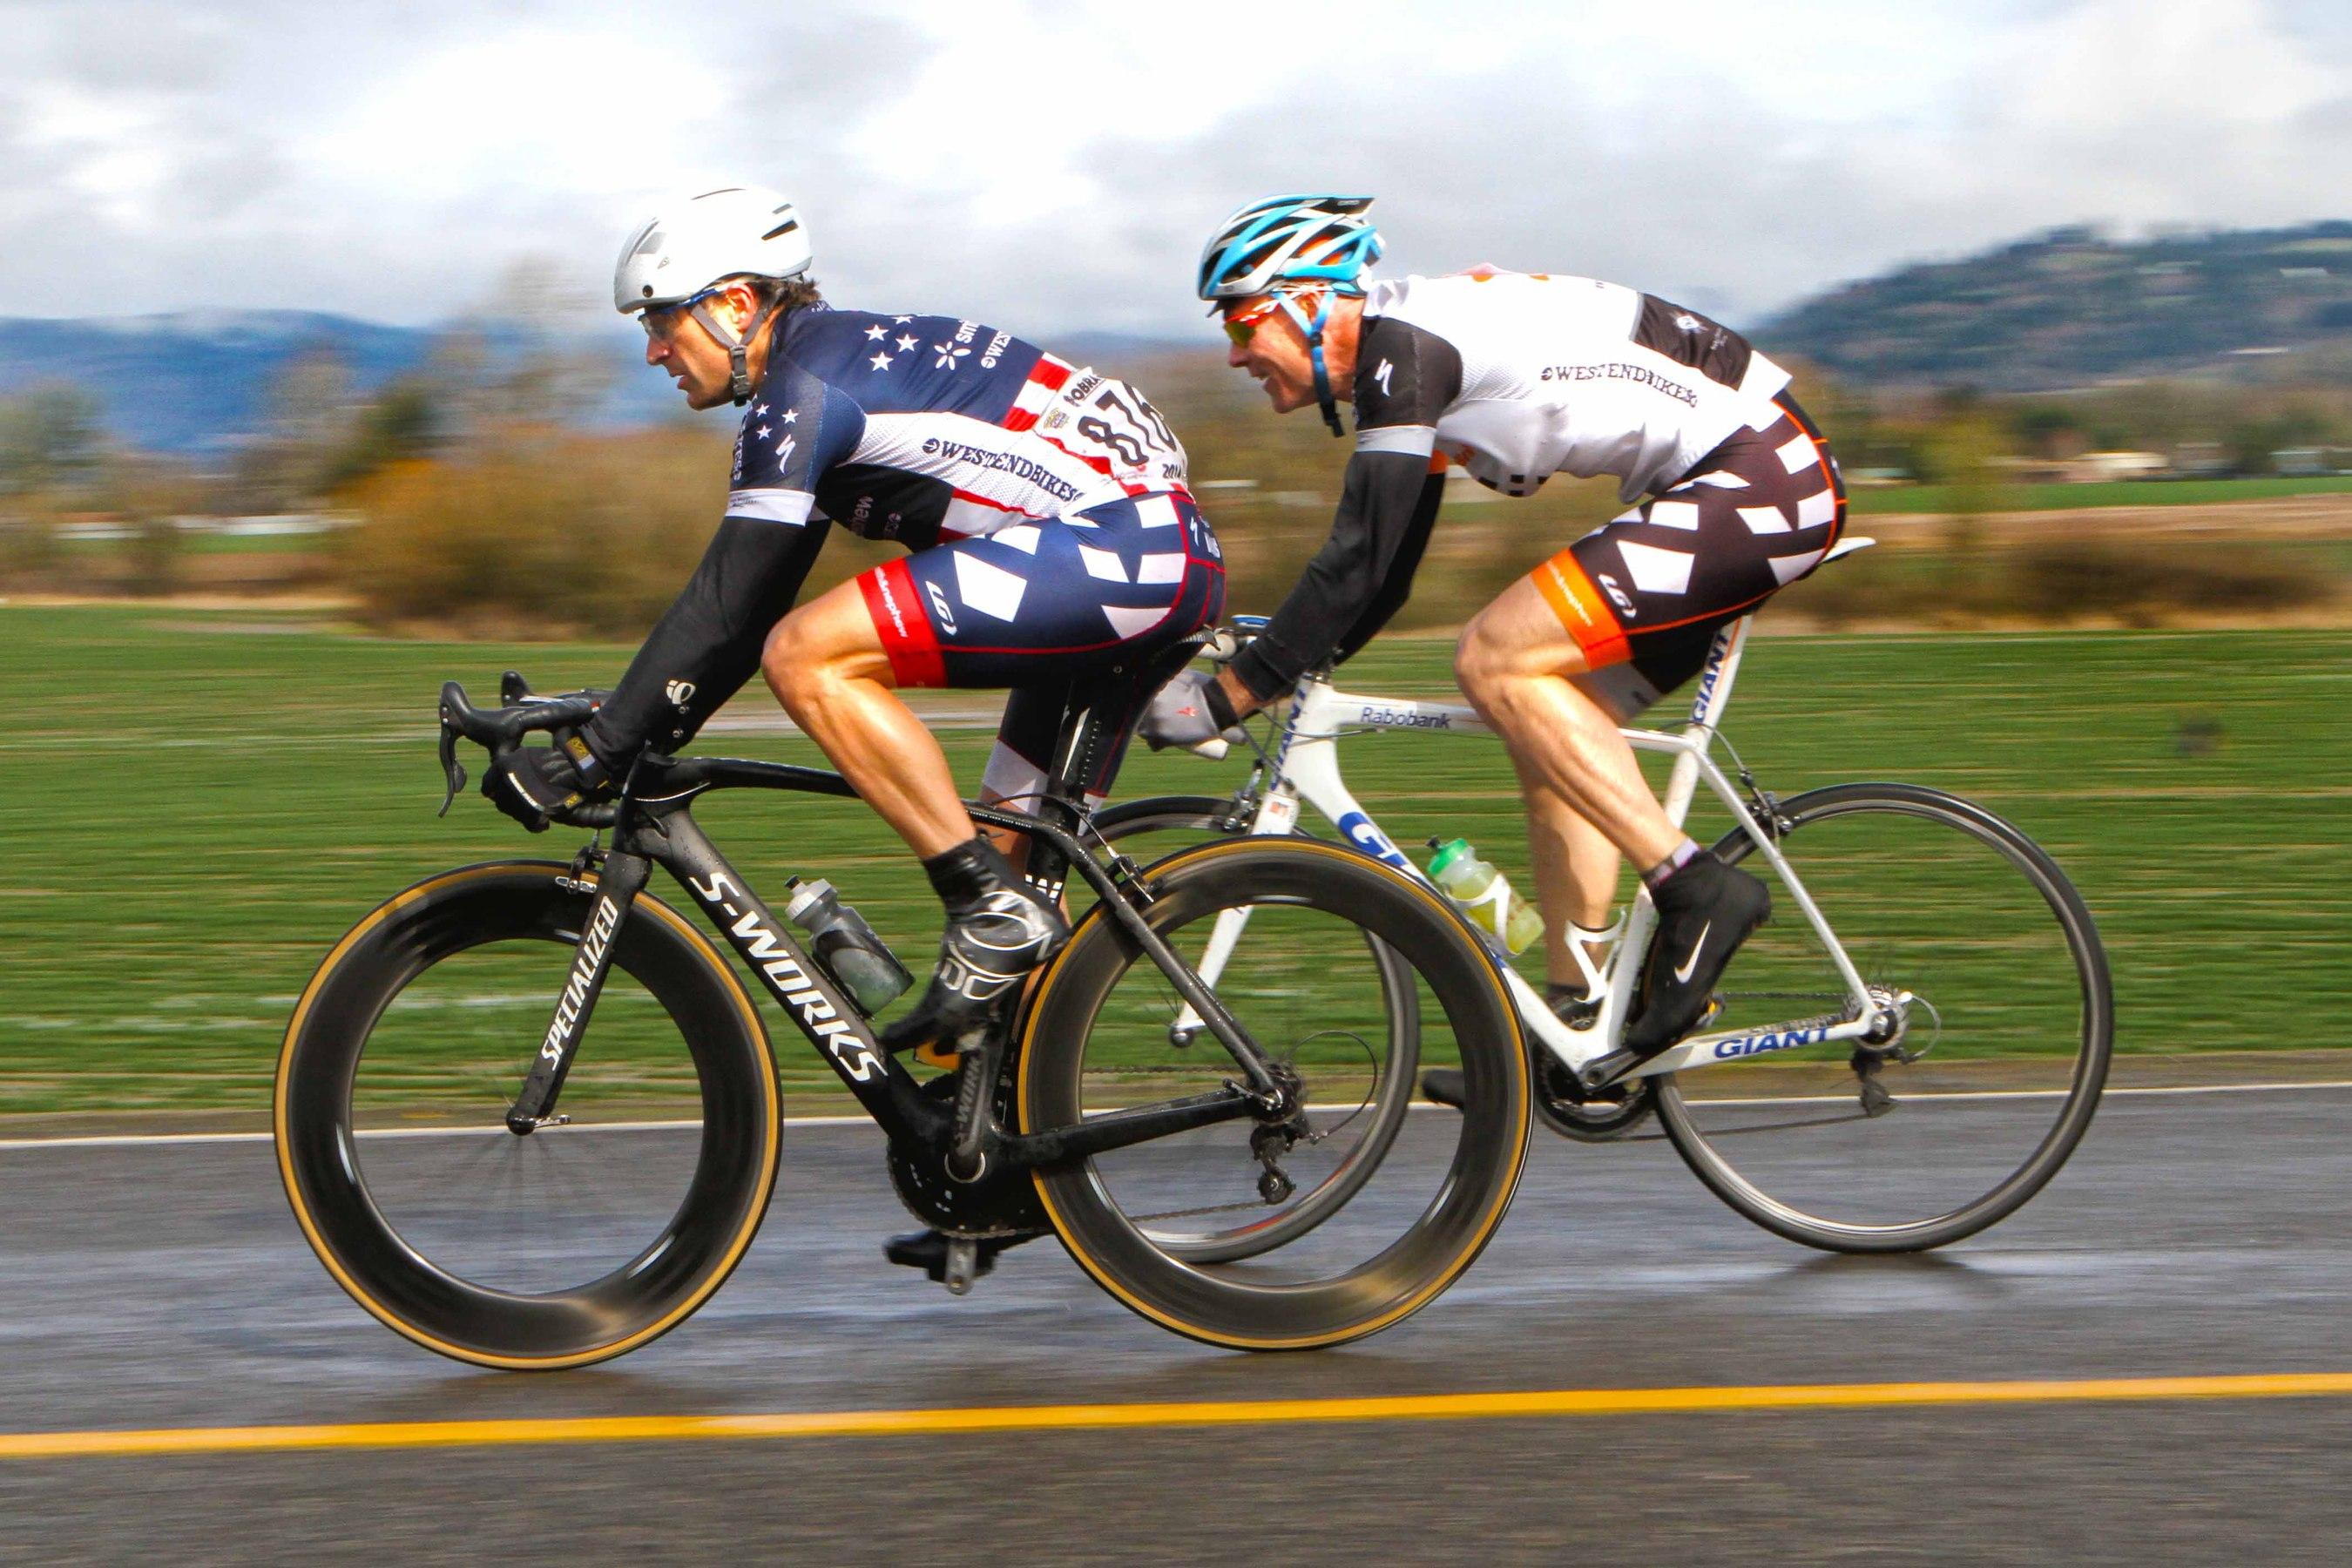 Bicycle Racing Wallpaper